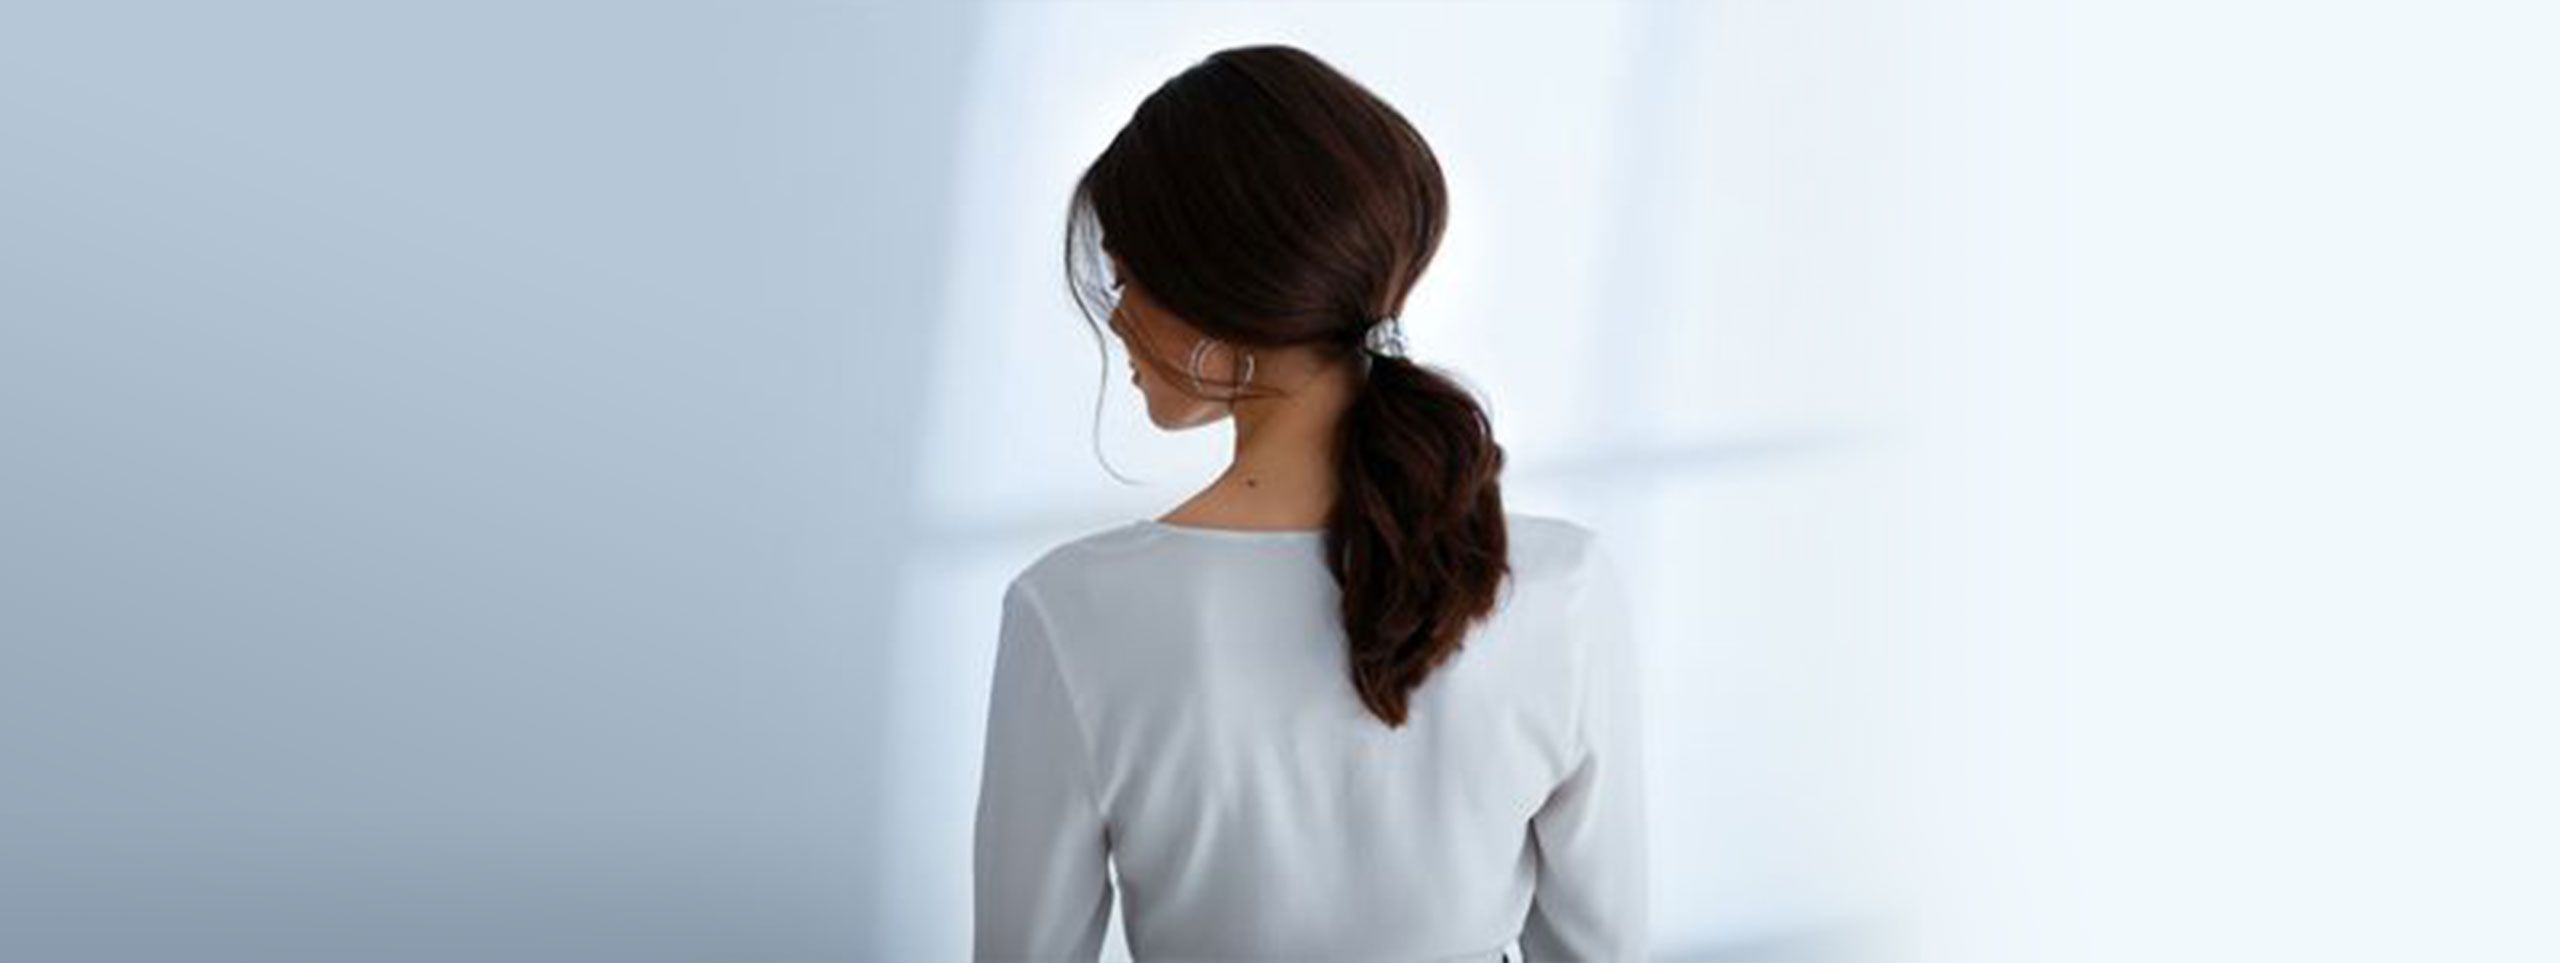 Round hair clips